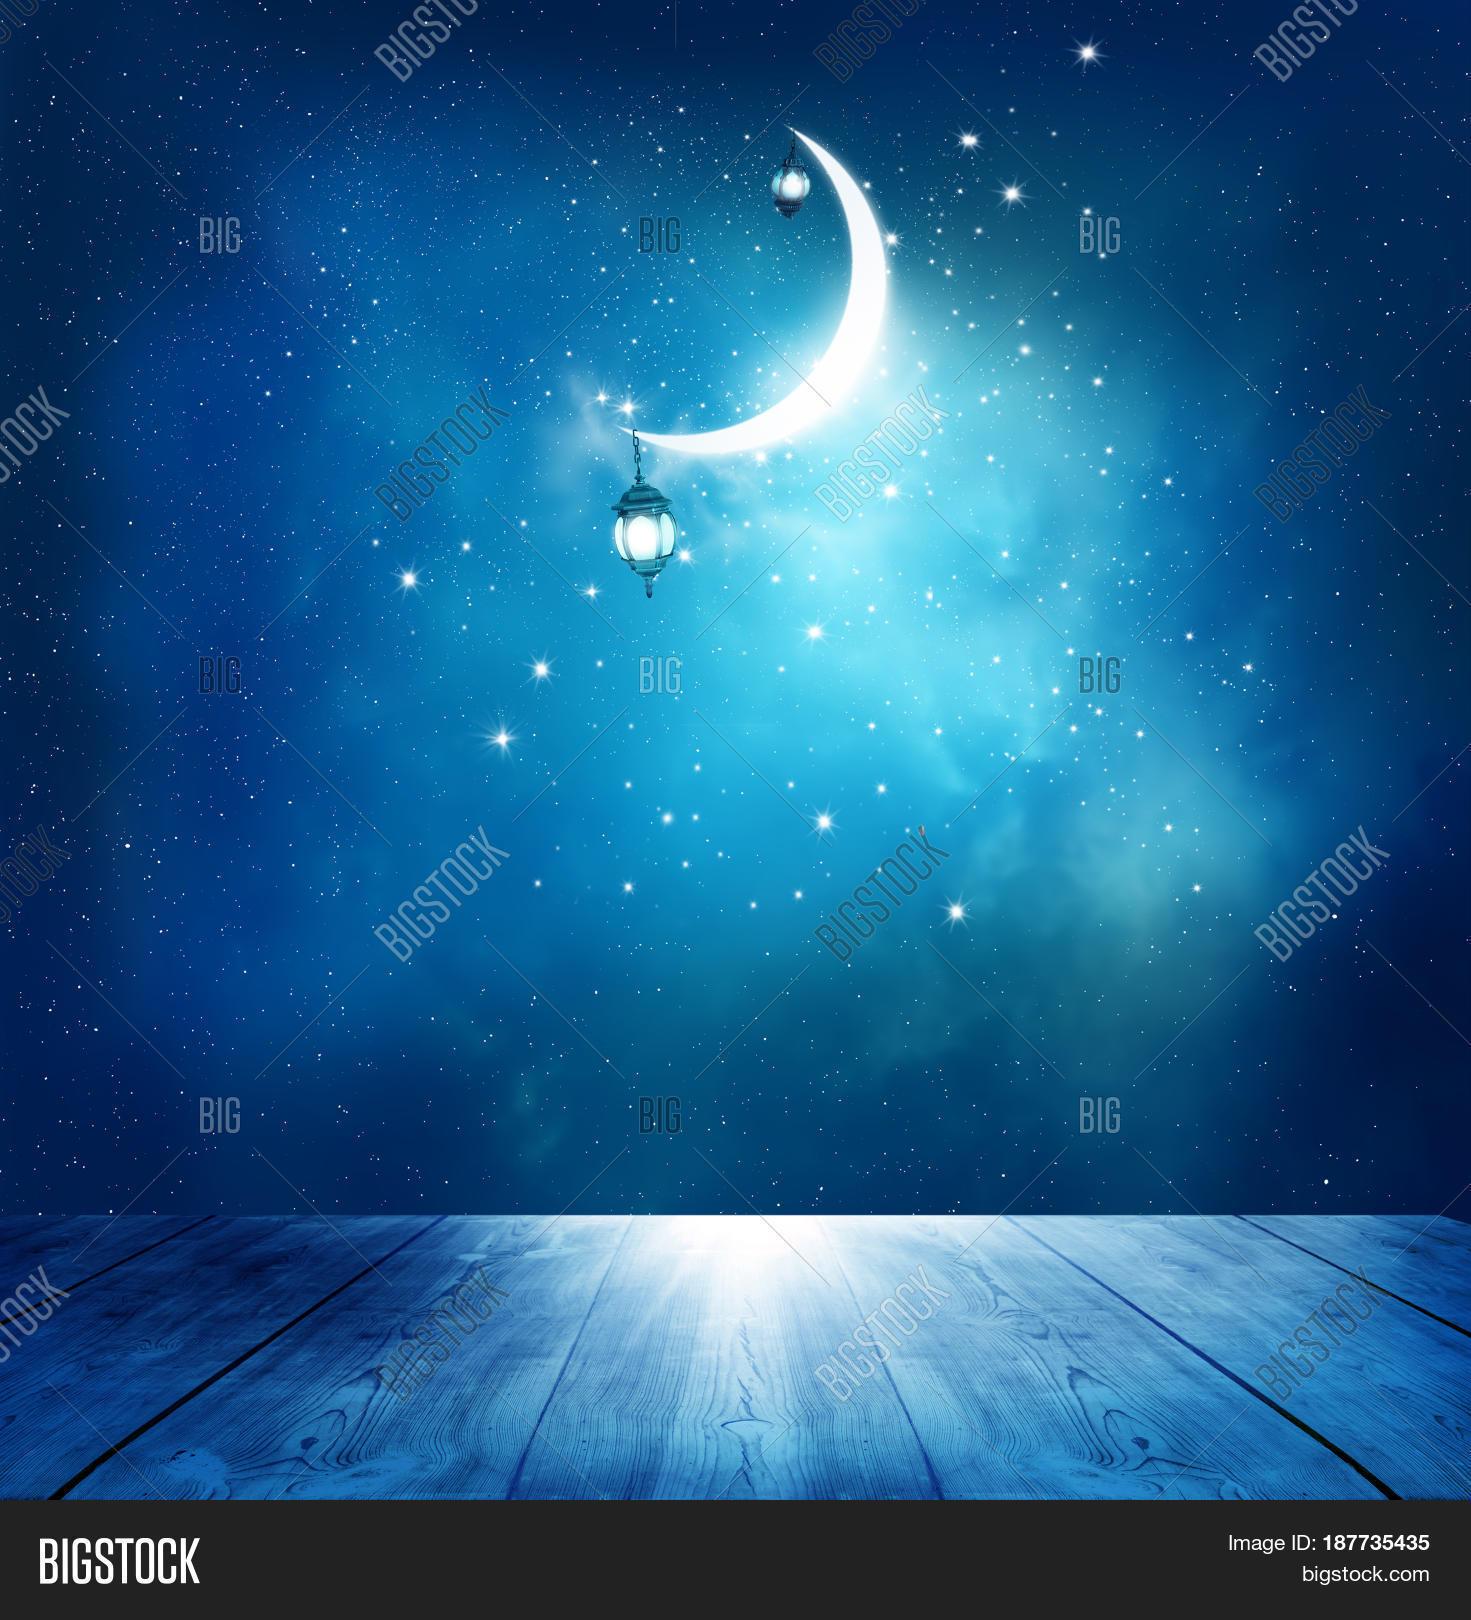 Islamic Greeting Eid Image Photo Free Trial Bigstock